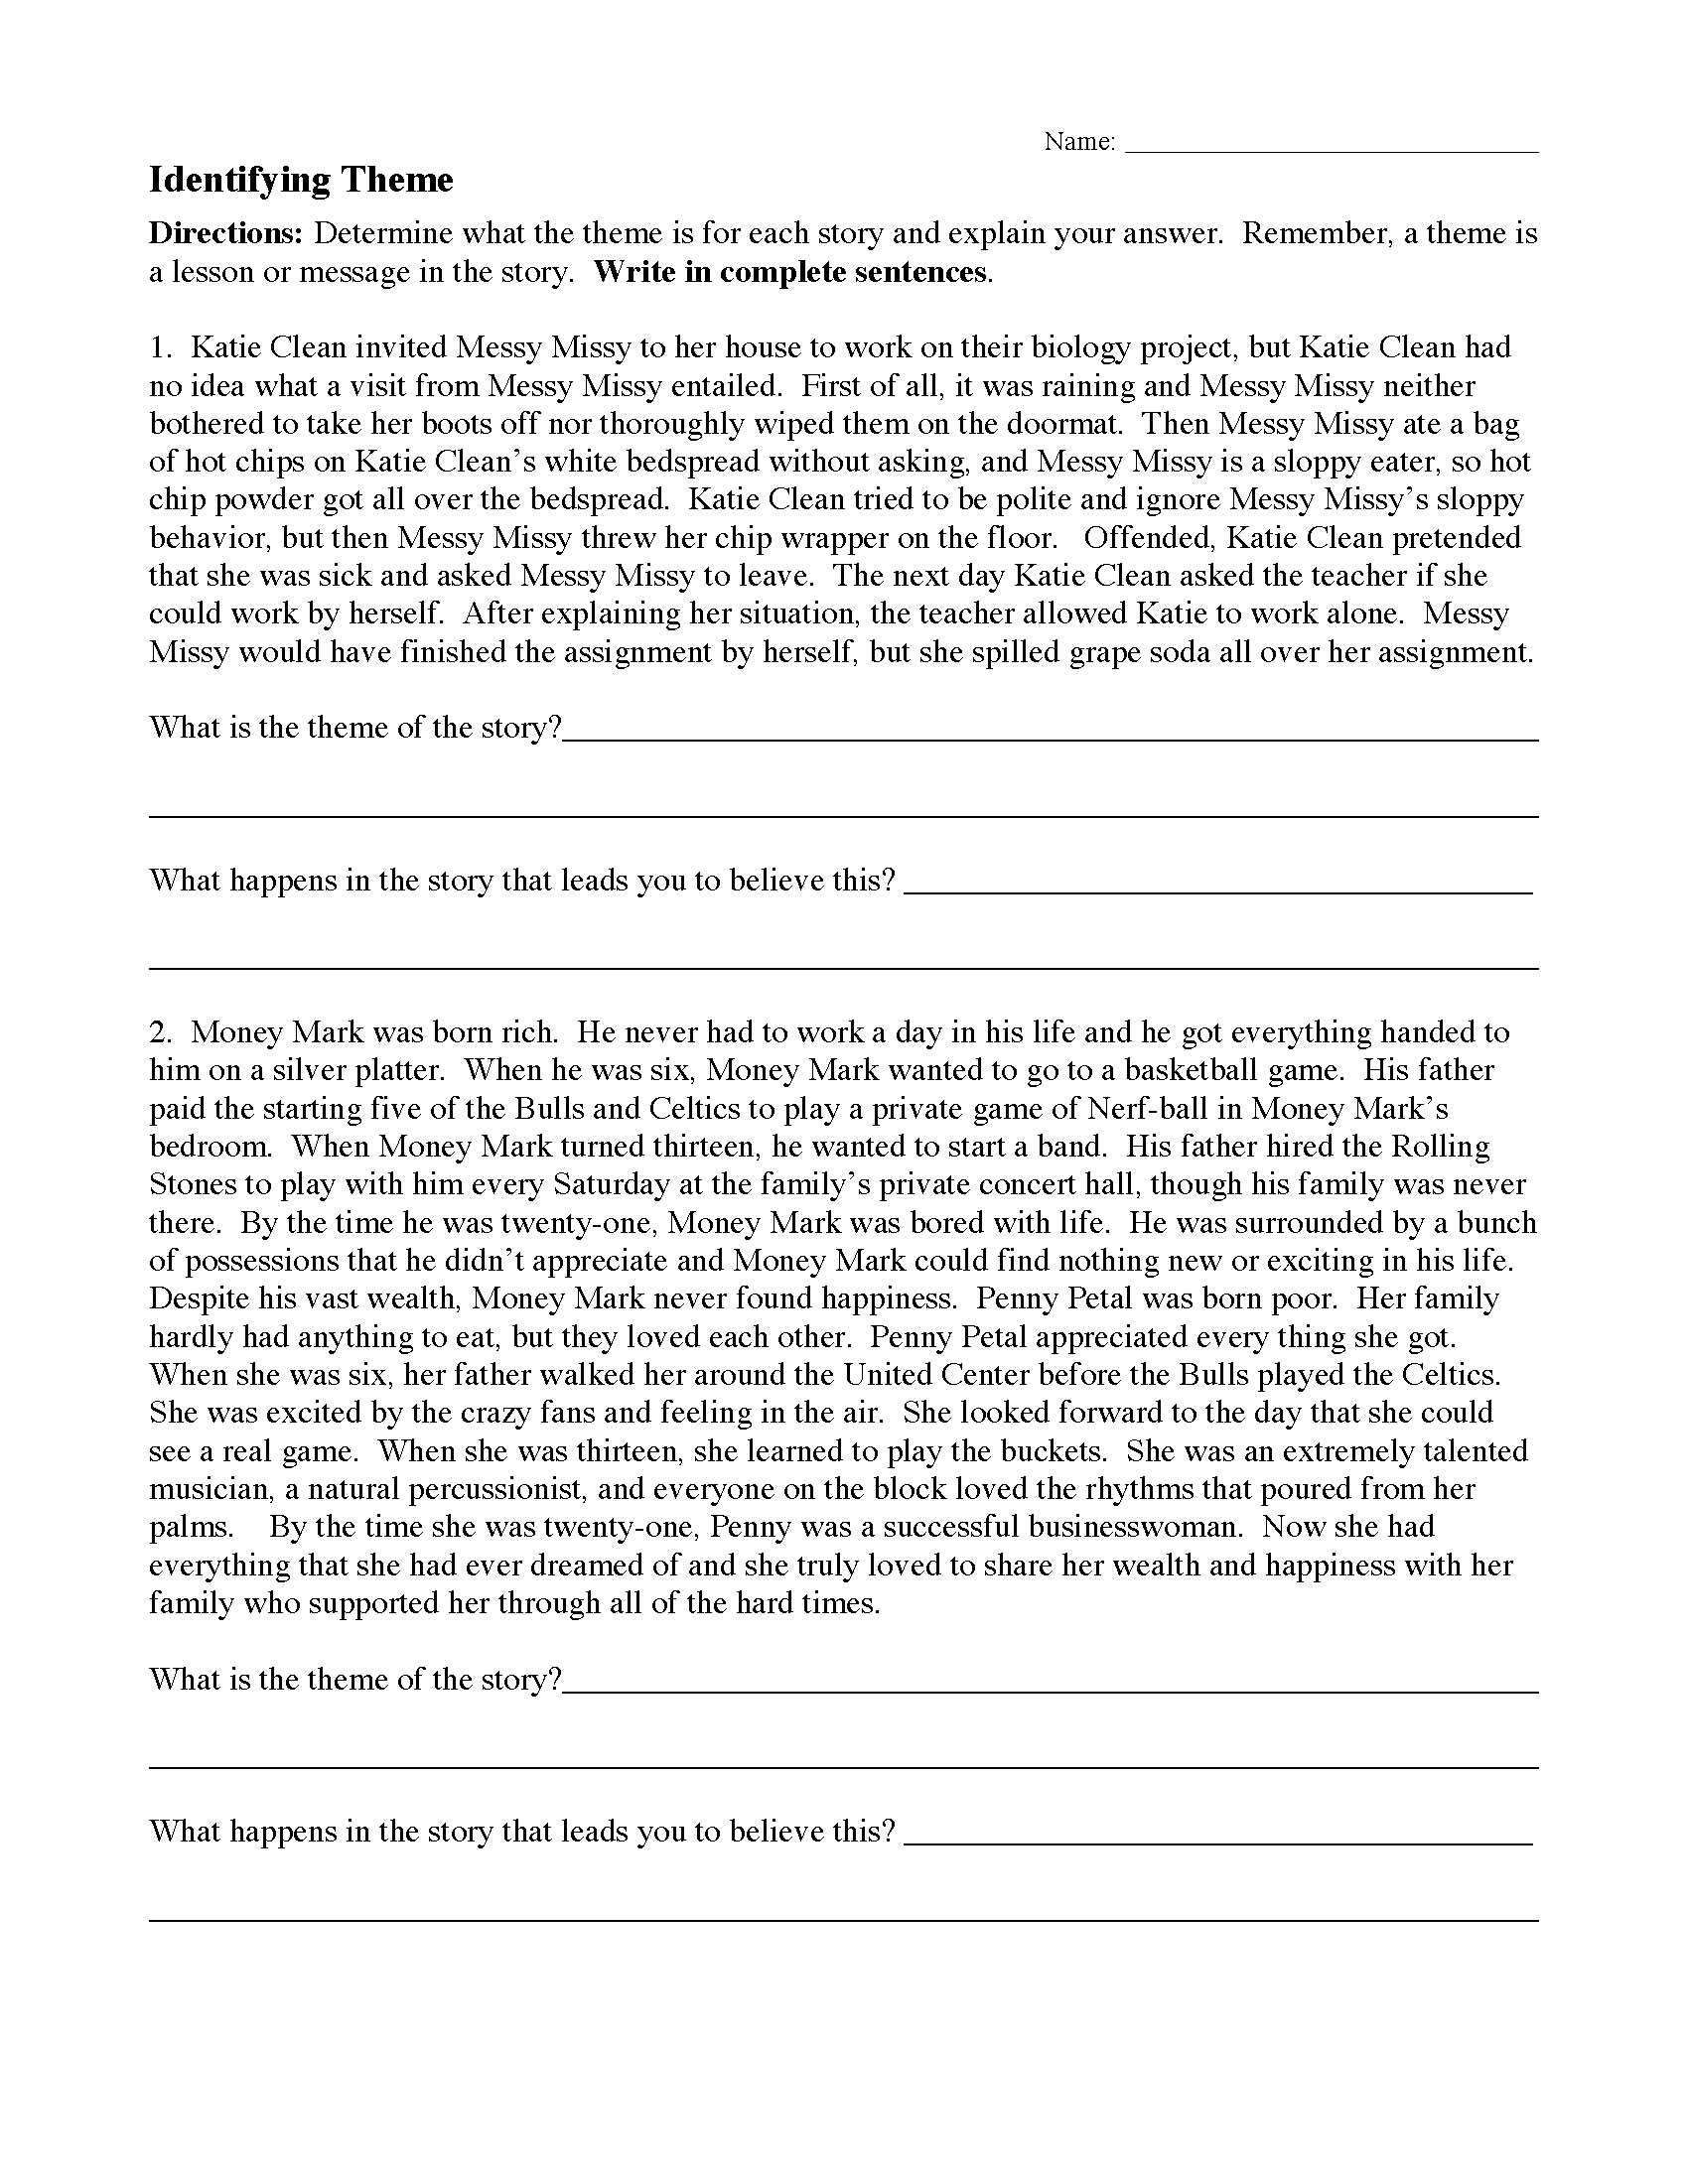 Theme Worksheet 1